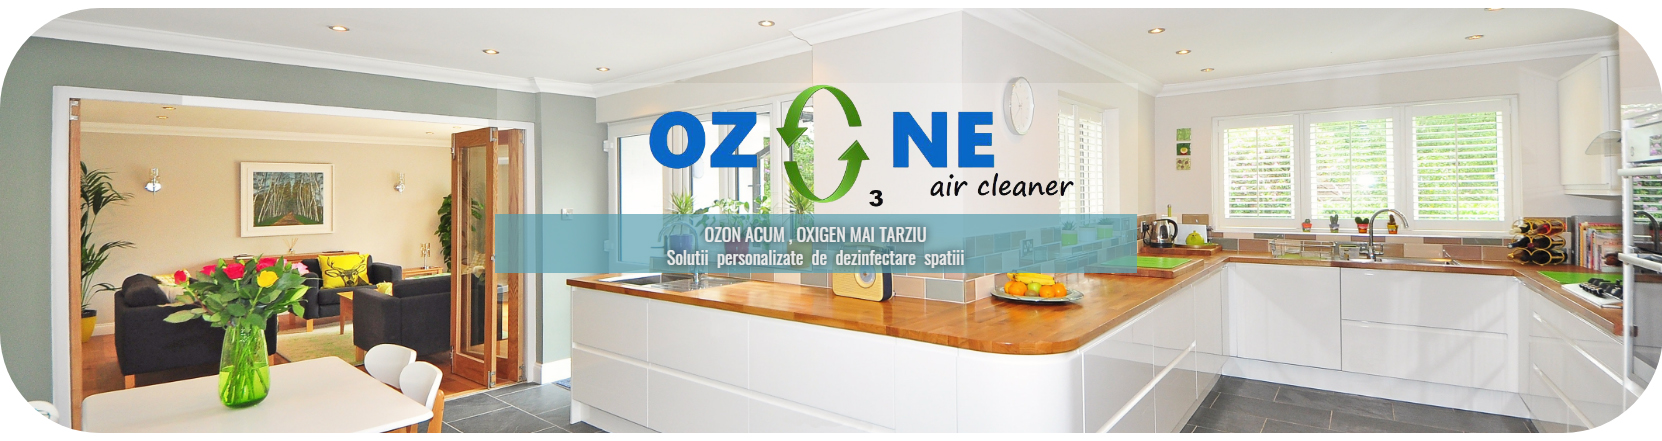 Ozone air cleaner 3